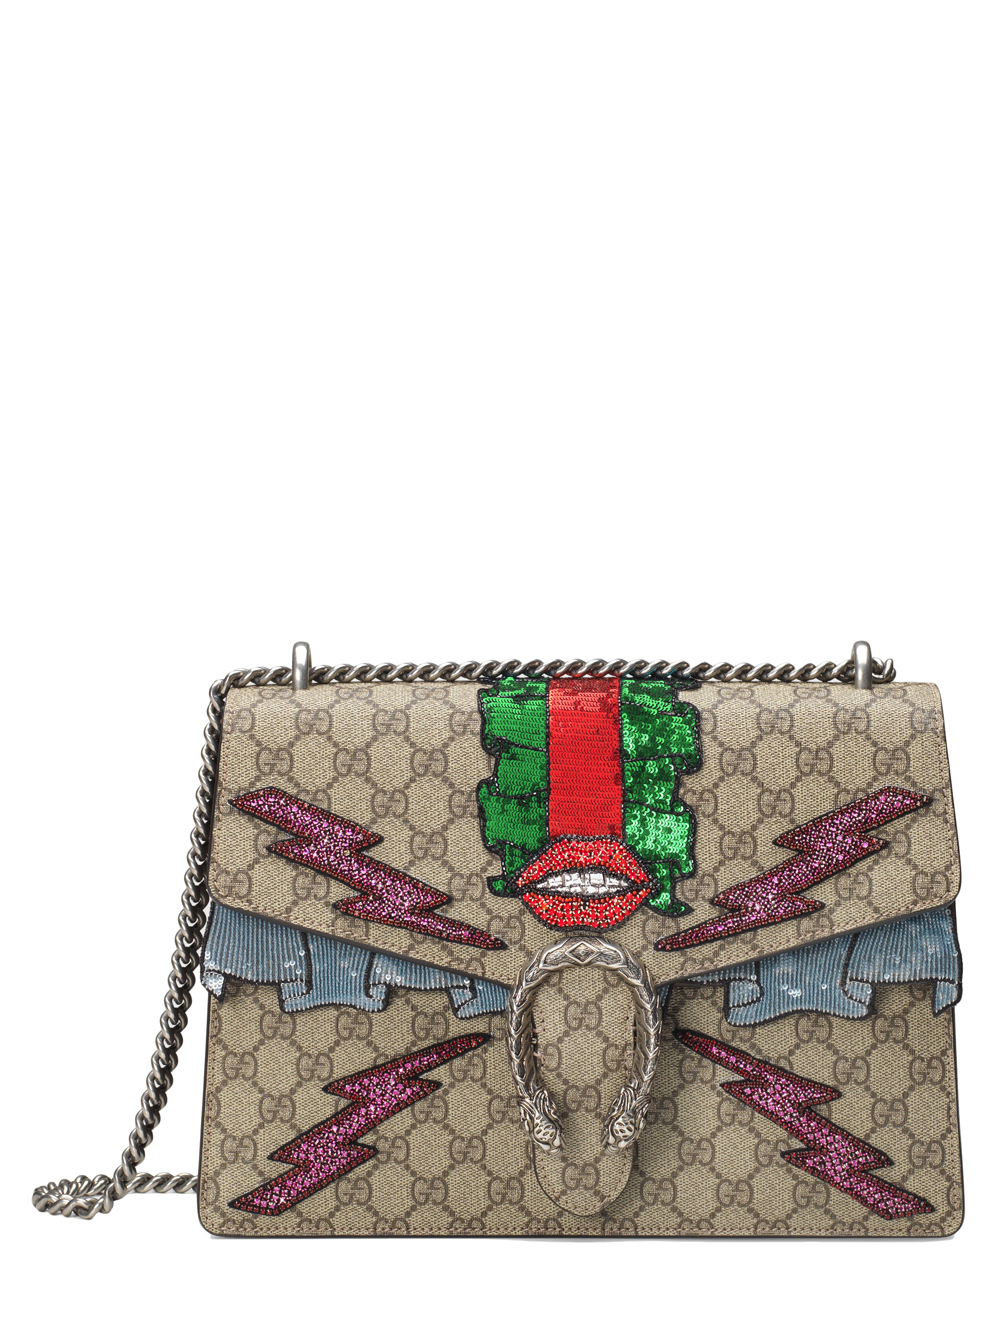 KirnaZabete-Gucci-Dionysus-GG-Supreme-Embroidered-Bag-31.jpg